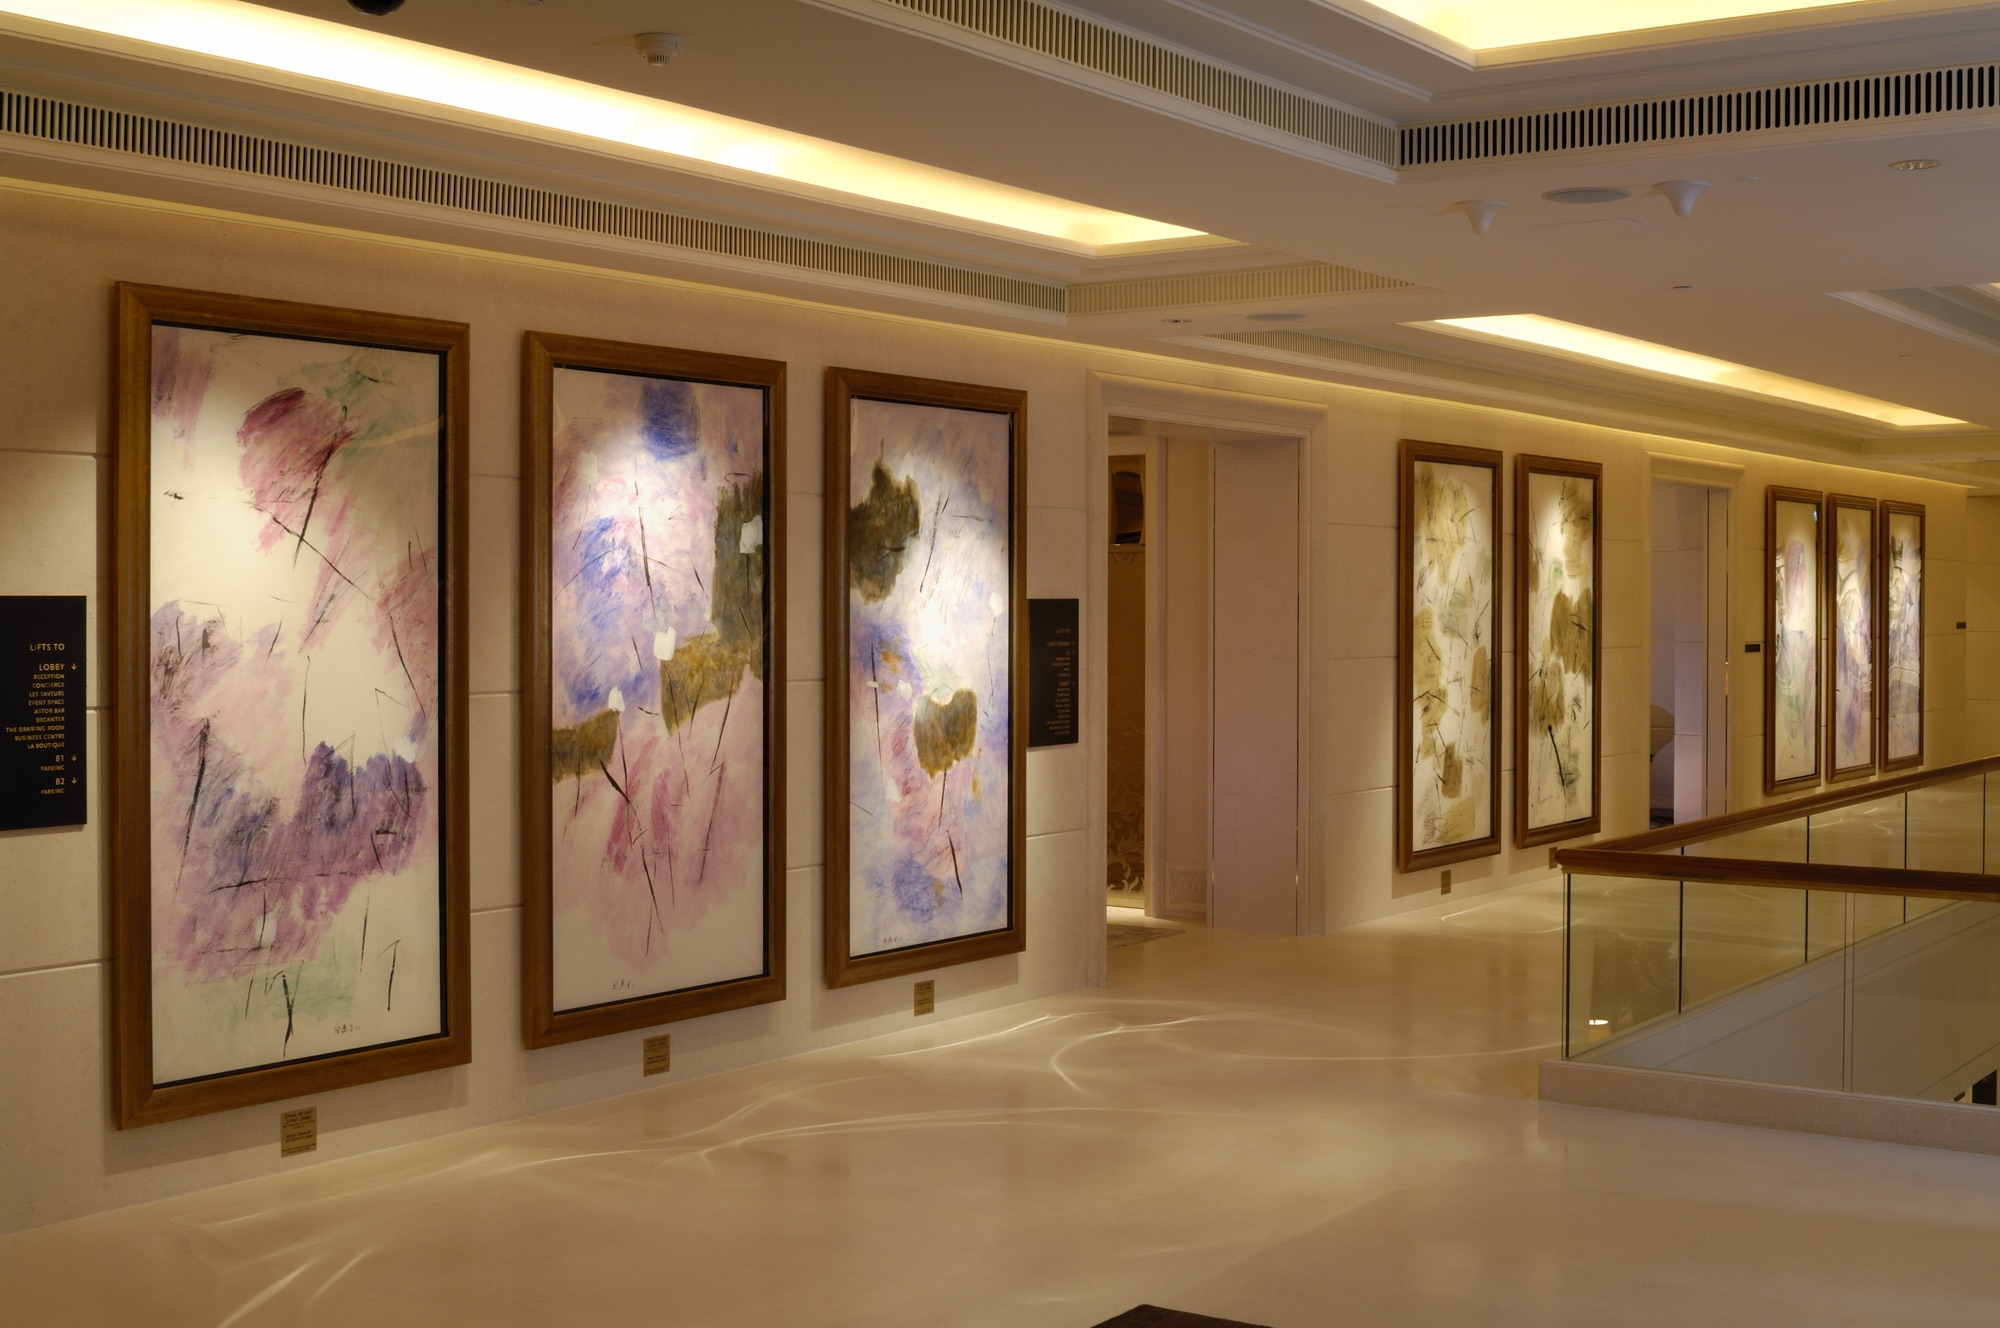 chua-ek-kay_lotus-pond-series_level-1u-corridor